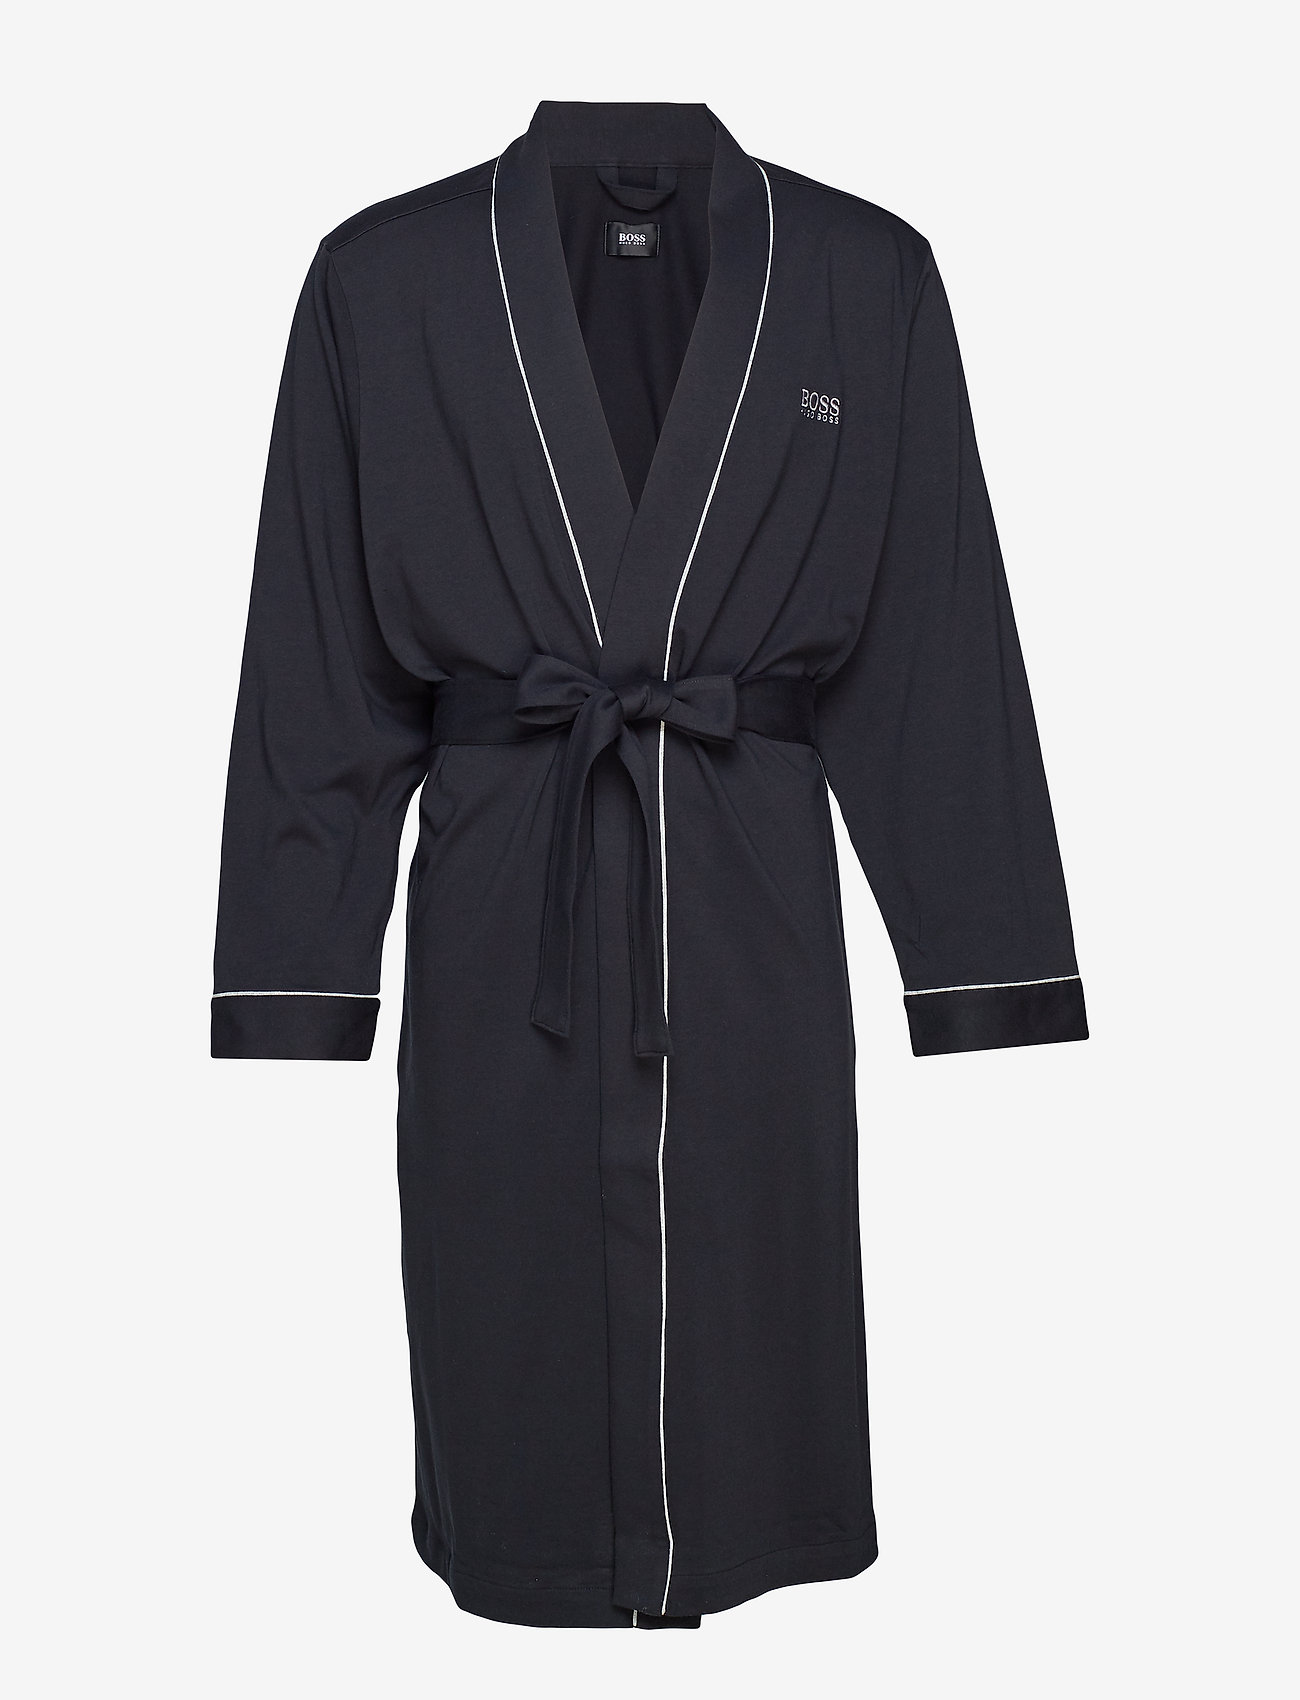 BOSS - Kimono BM - morgenkåper - black - 1